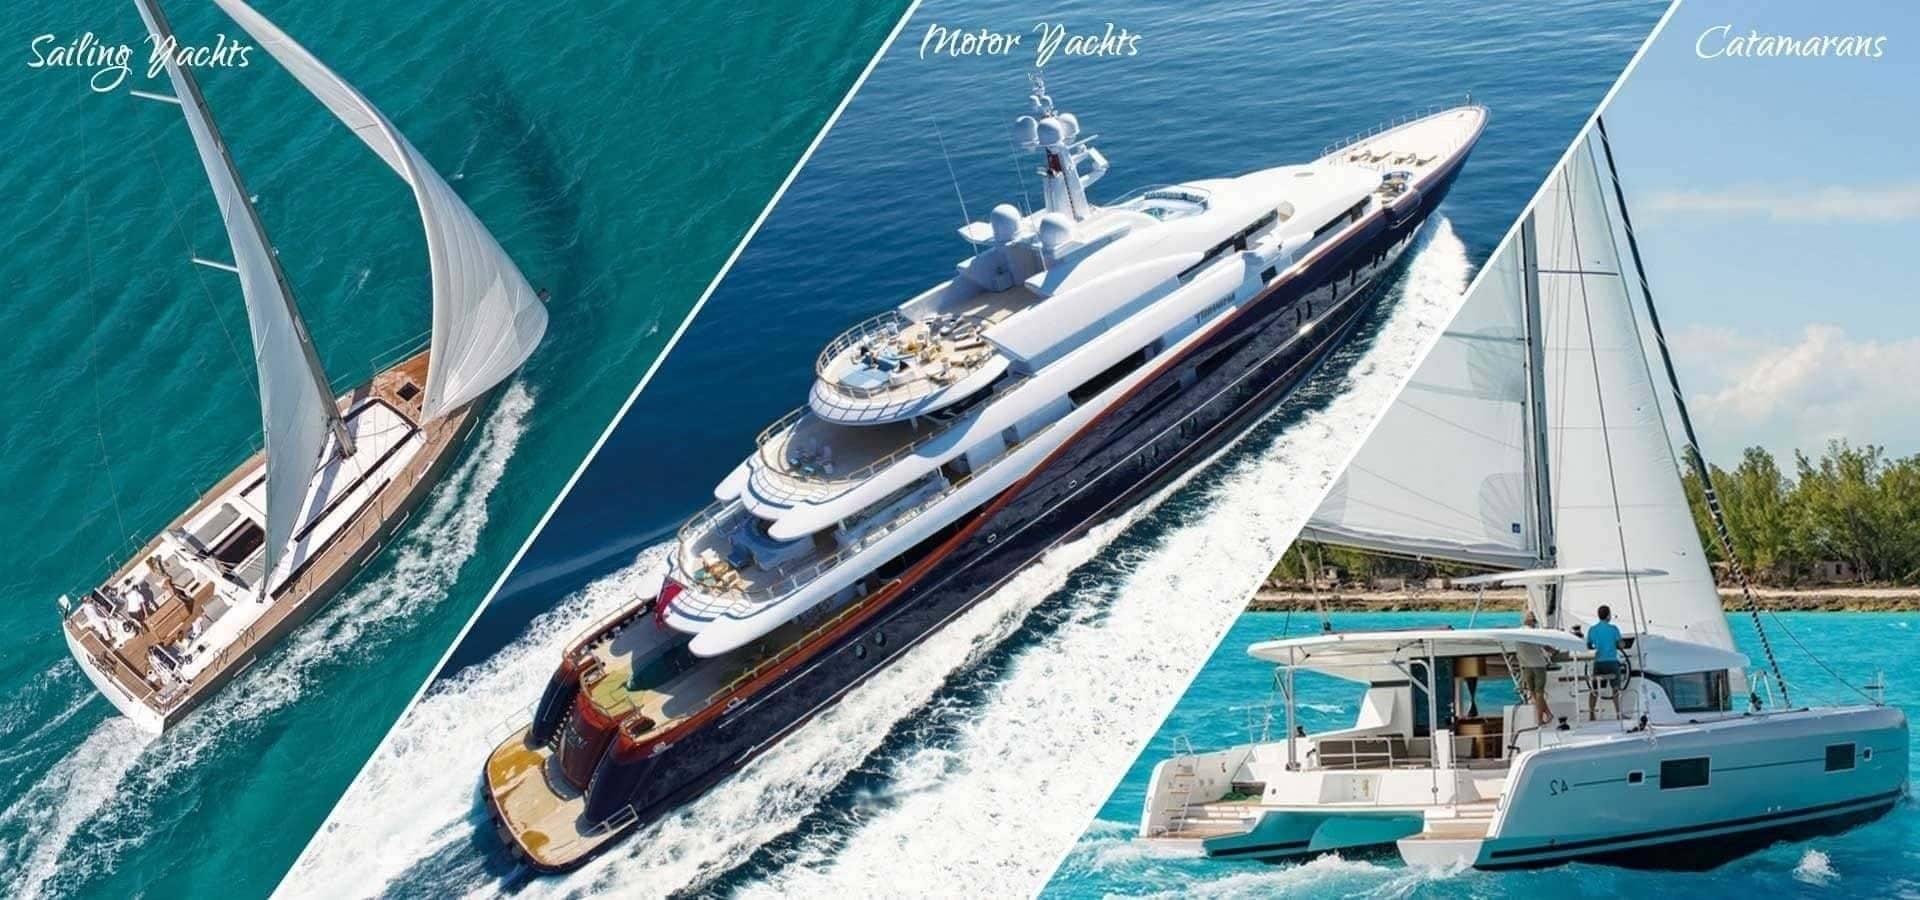 Europe yacht Charter Sailing Yachts, Catamaran, Luxury Yacht Charter